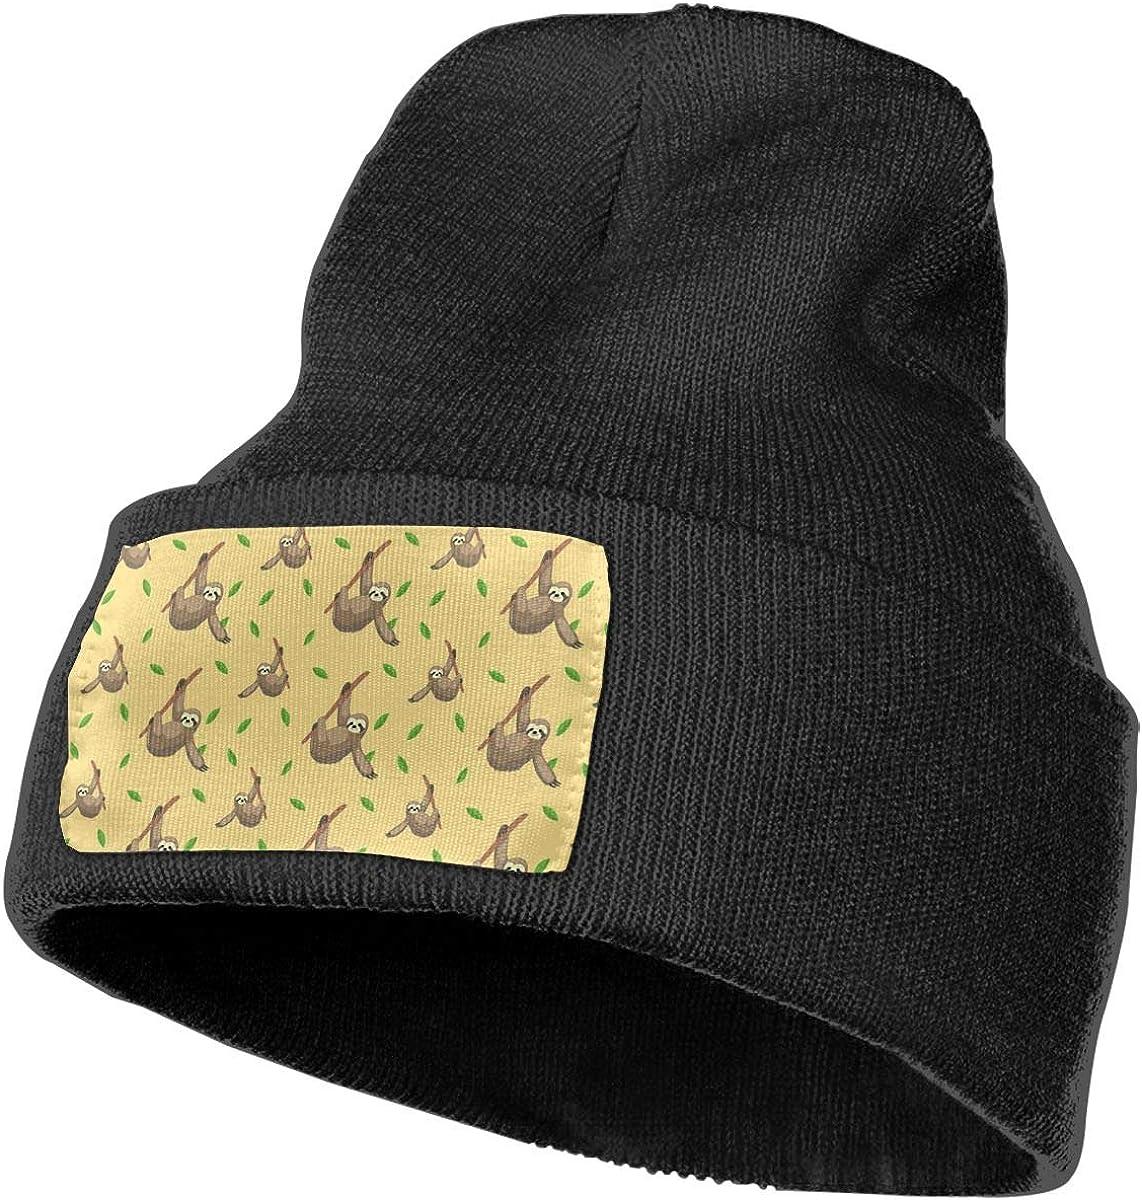 Ruin Sloth Fashion Knitting Hat for Men Women 100/% Acrylic Acid Mas Beanie Hat